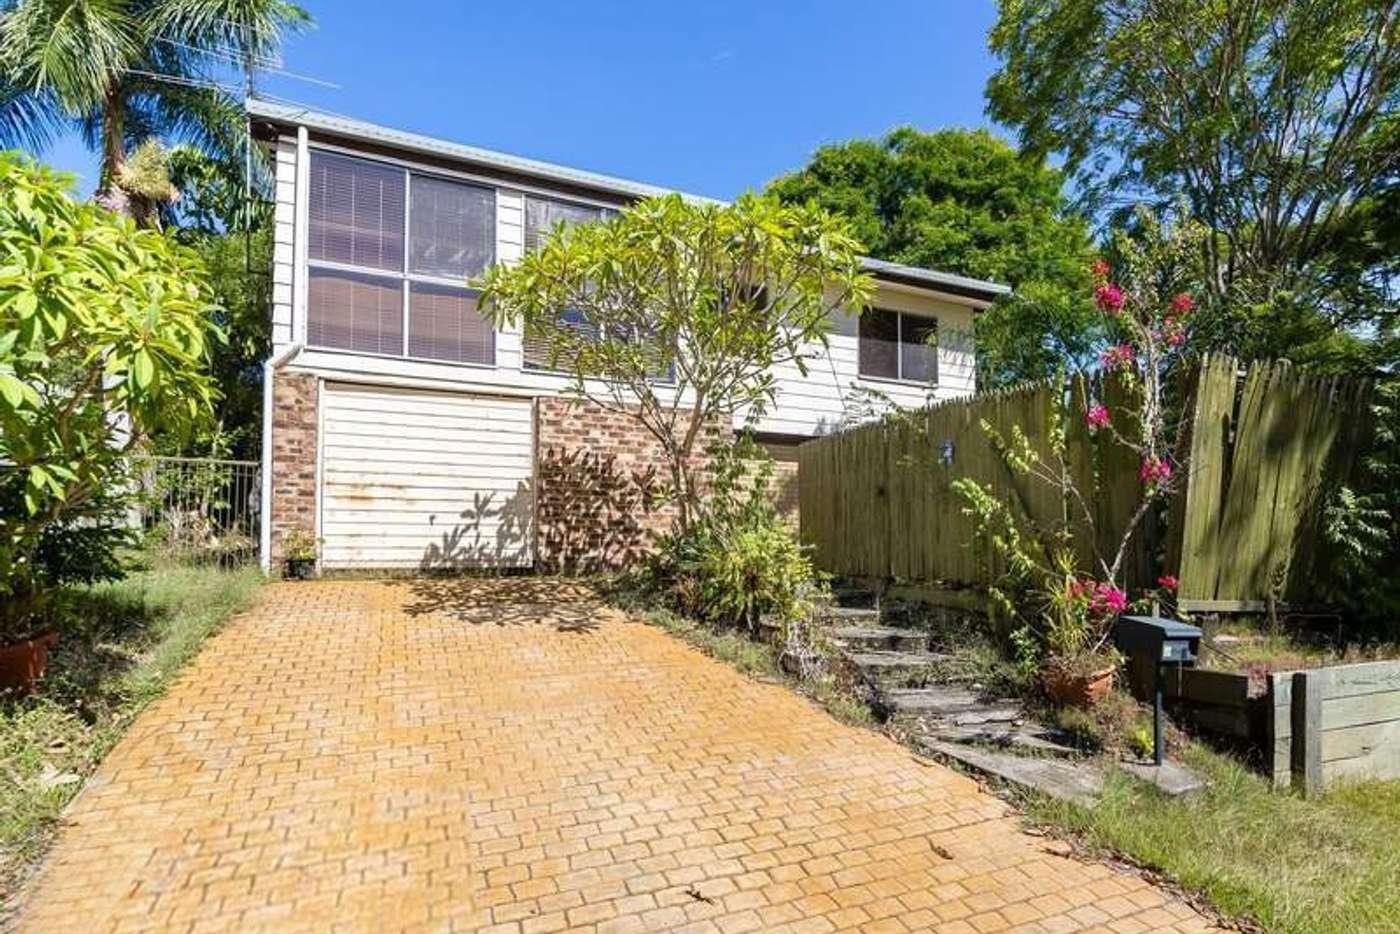 Main view of Homely house listing, 3 Tonya Court, Woodridge QLD 4114